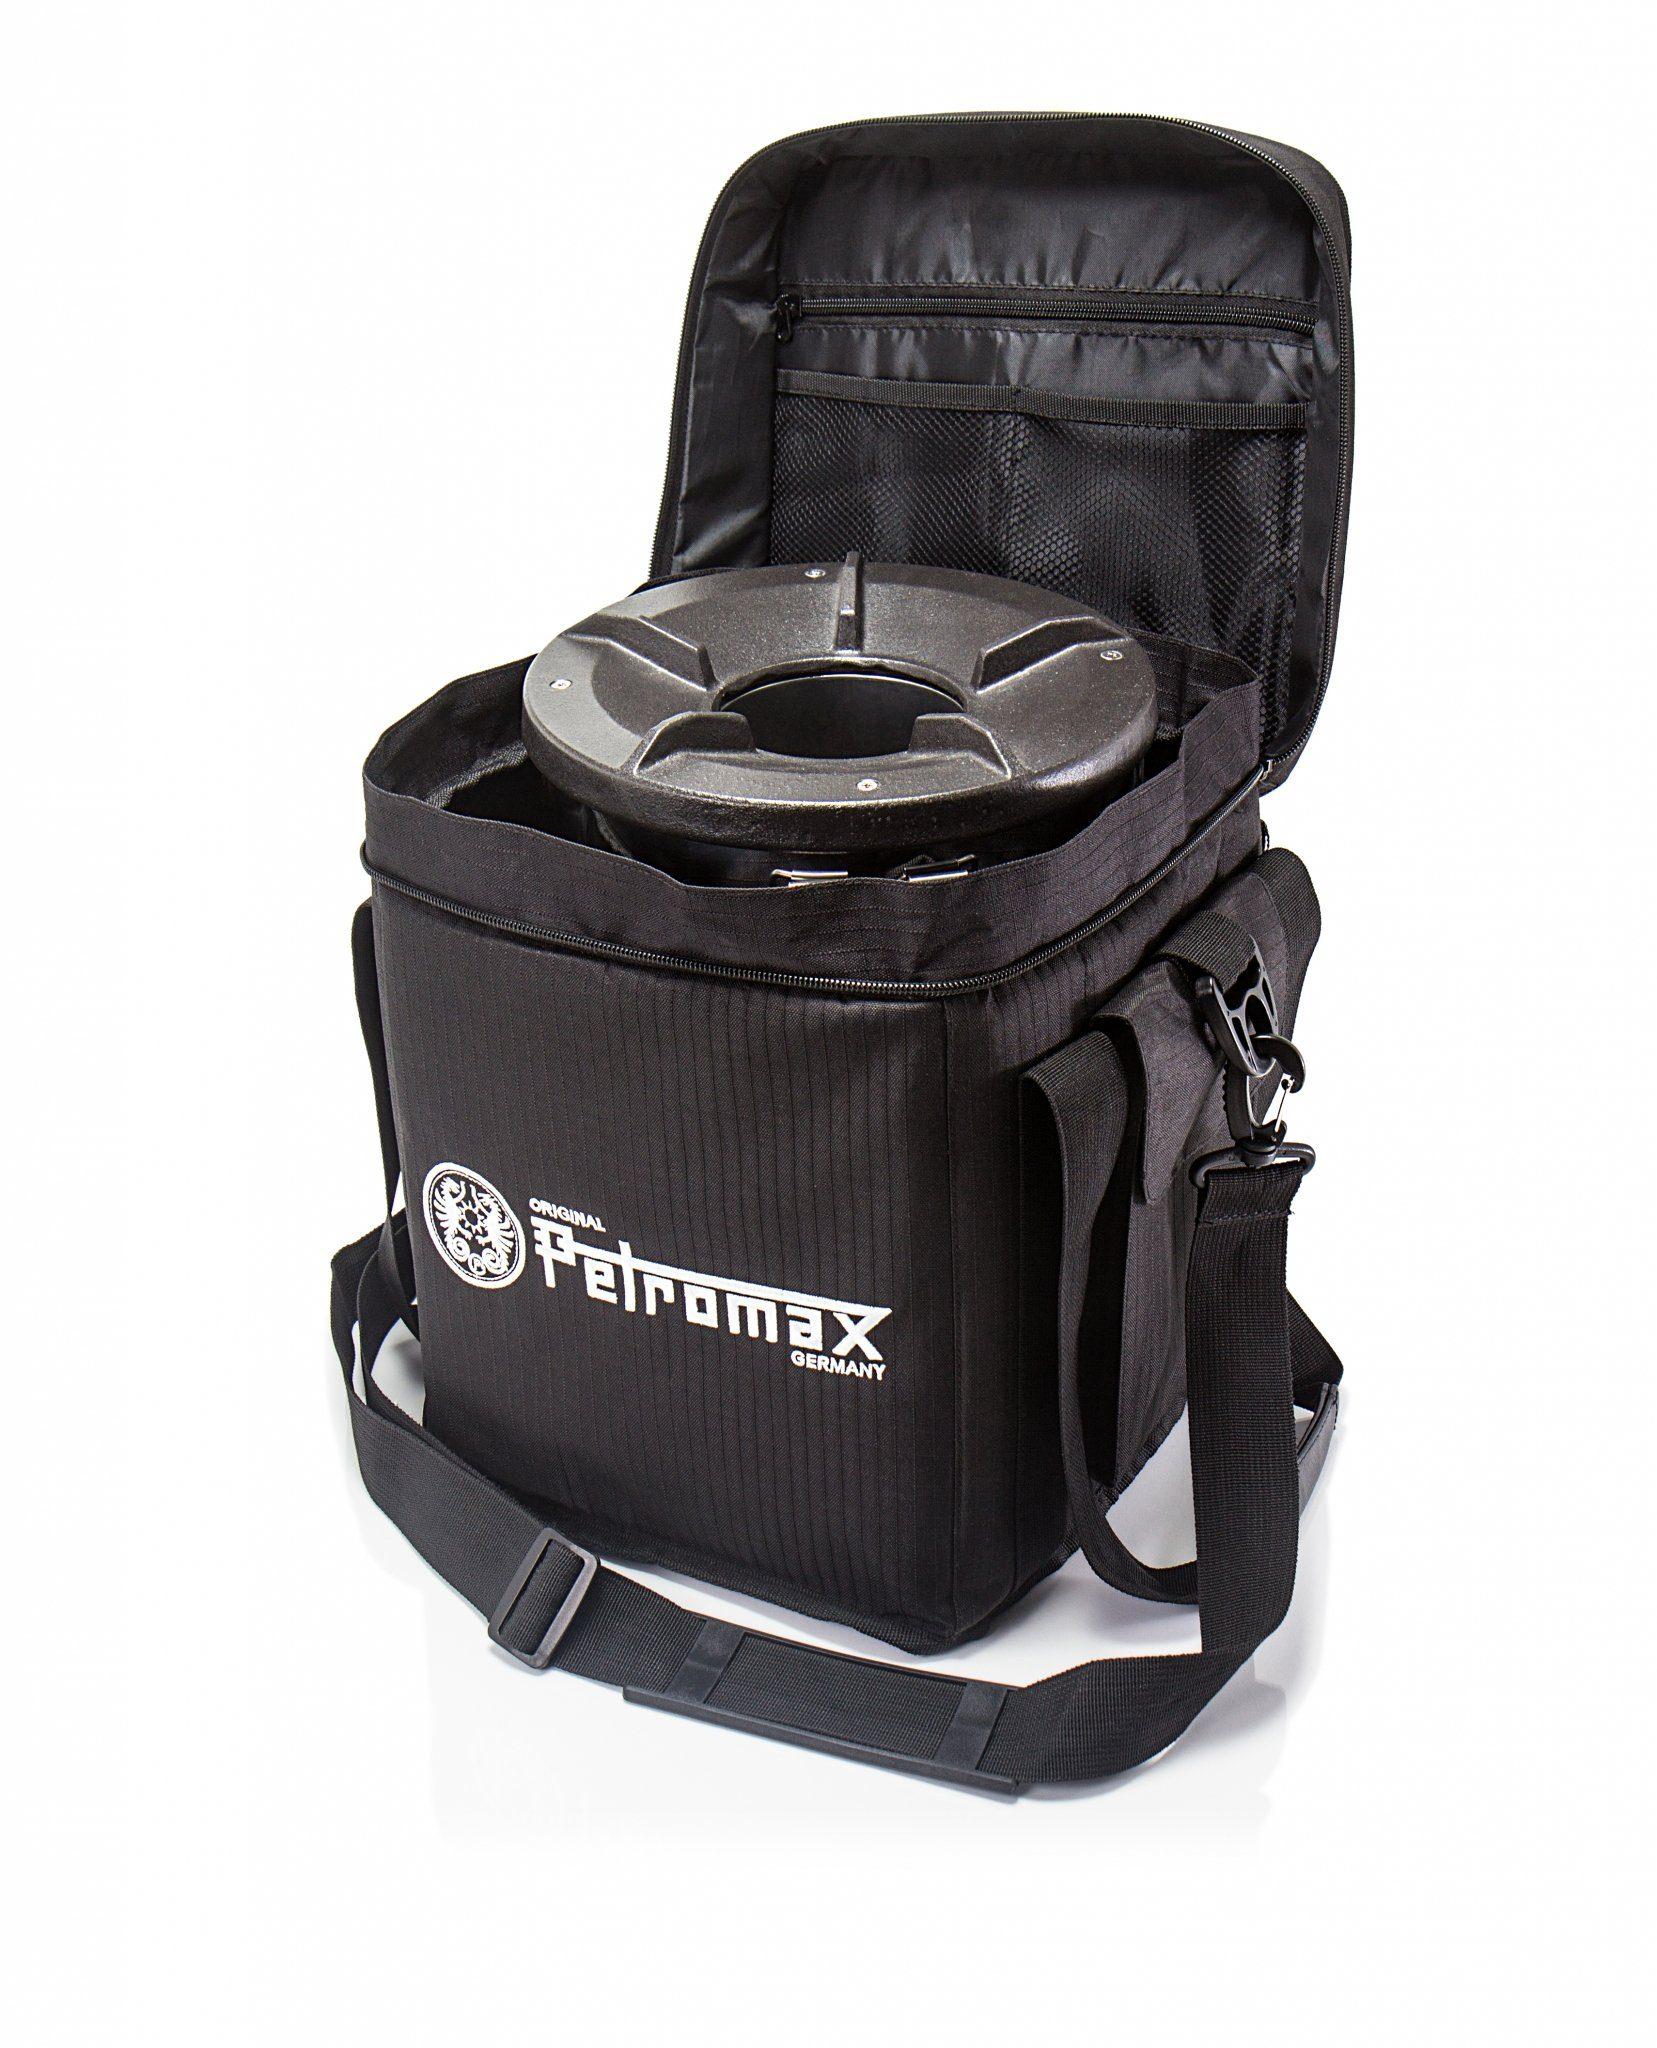 Petromax Camping-Kocher »Tasche«